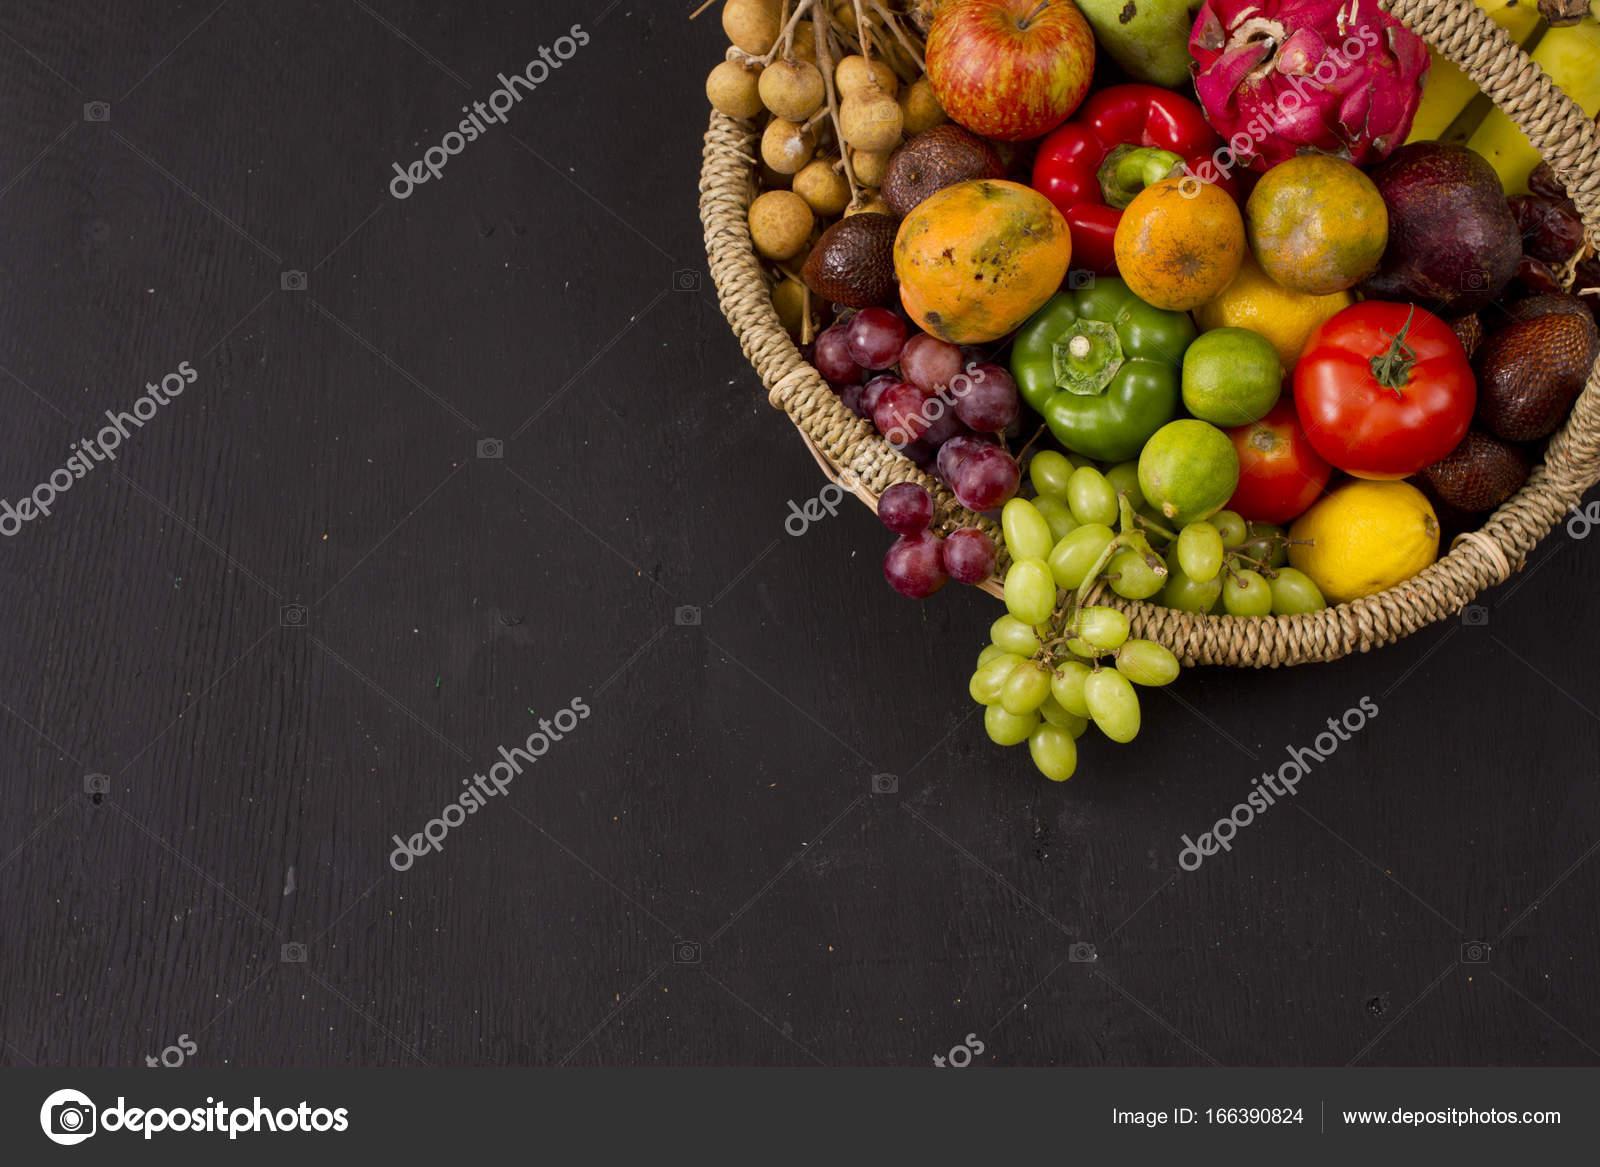 Фрукты на корзину — Стоковое фото © ismedhasibuan #166390824